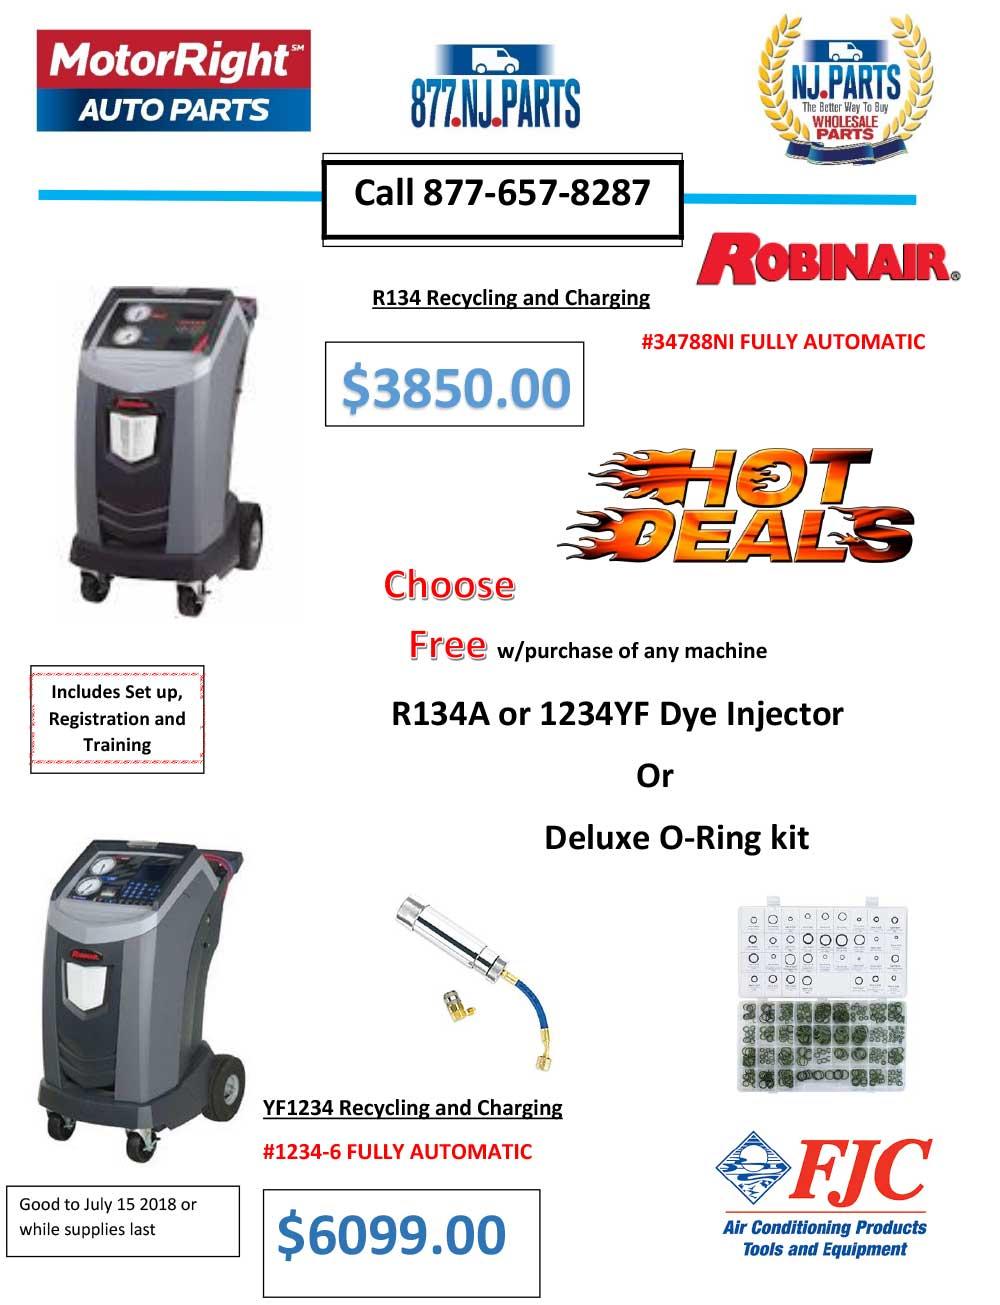 Robinair-Hot-Deal.jpg